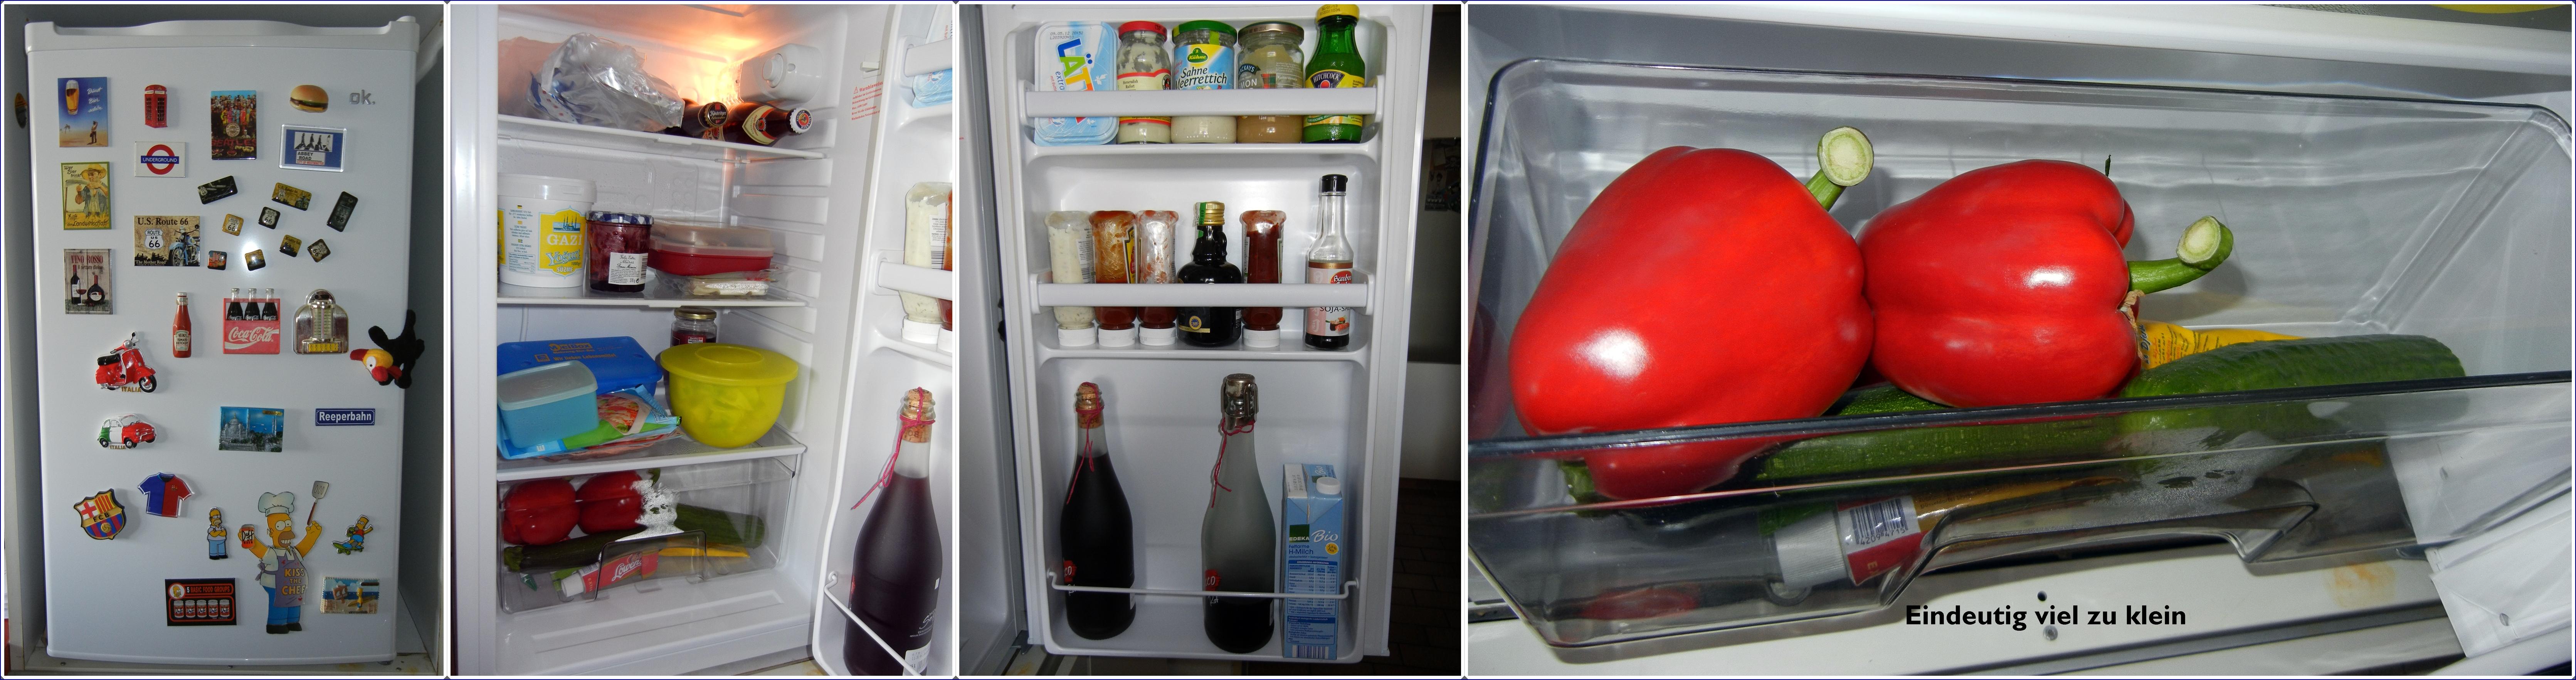 Kühlschrank OFR 200 Erfahrung